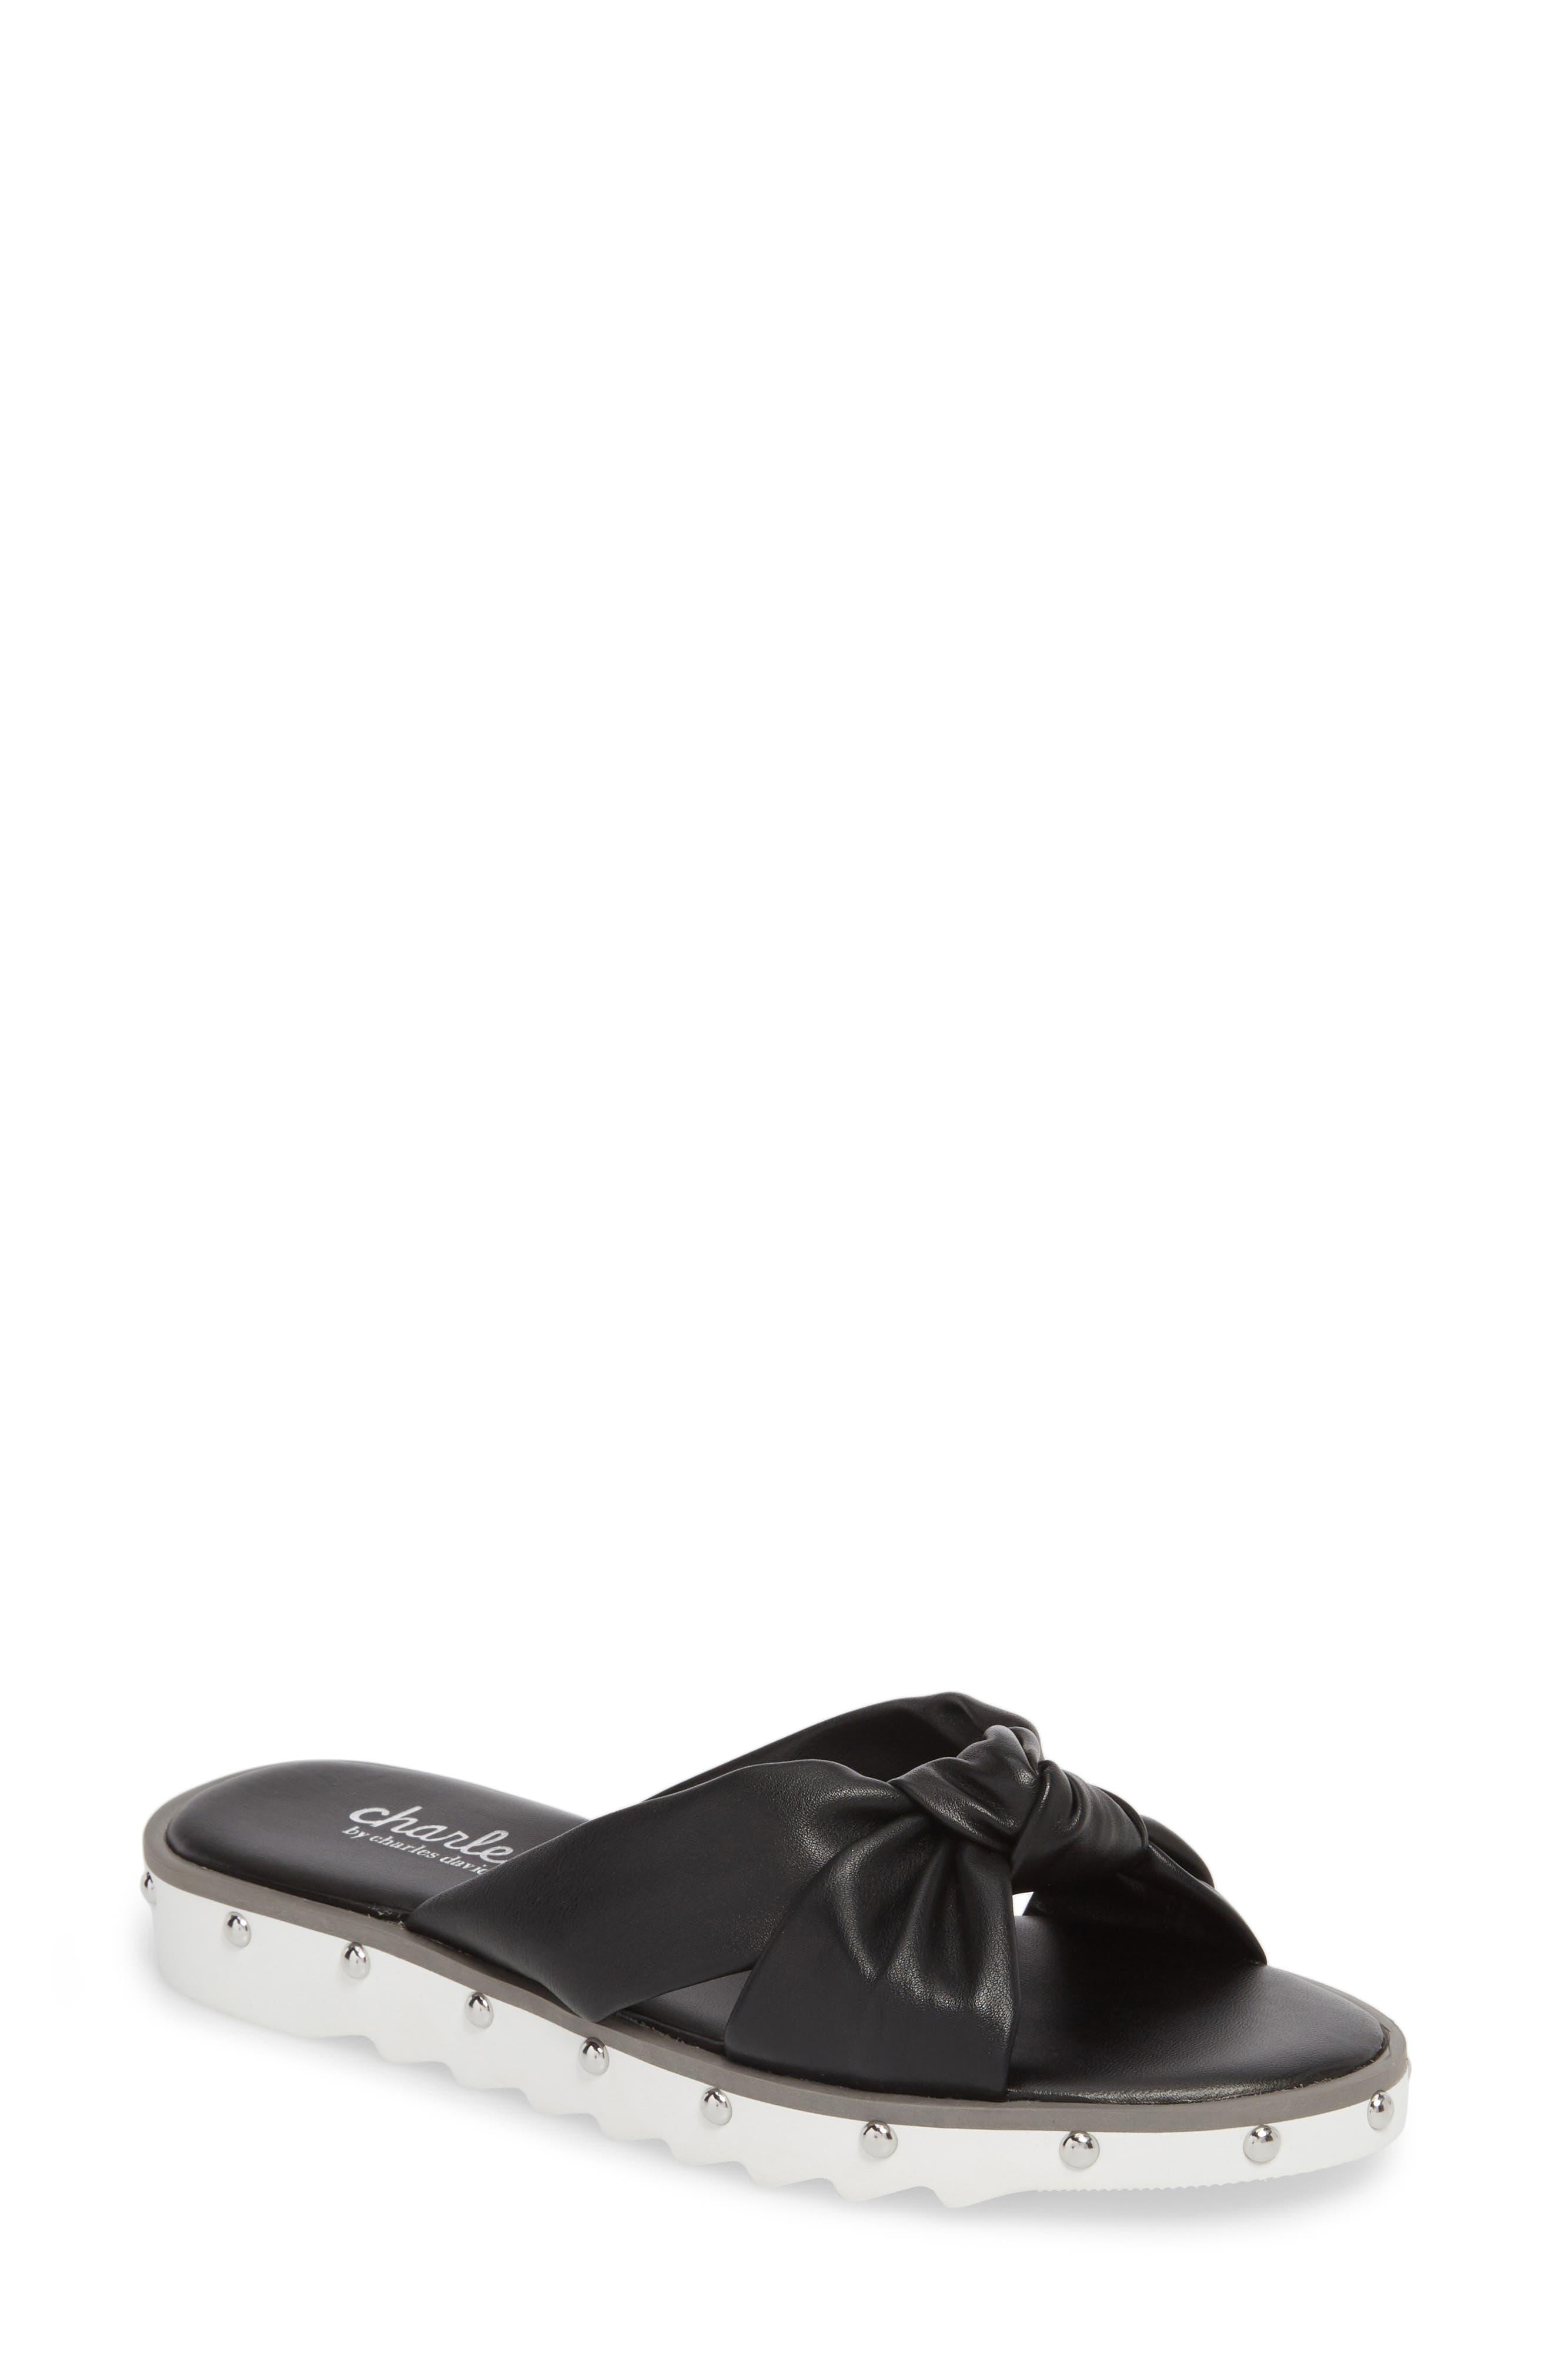 Charles By Charles David Snap Slide Sandal, Black